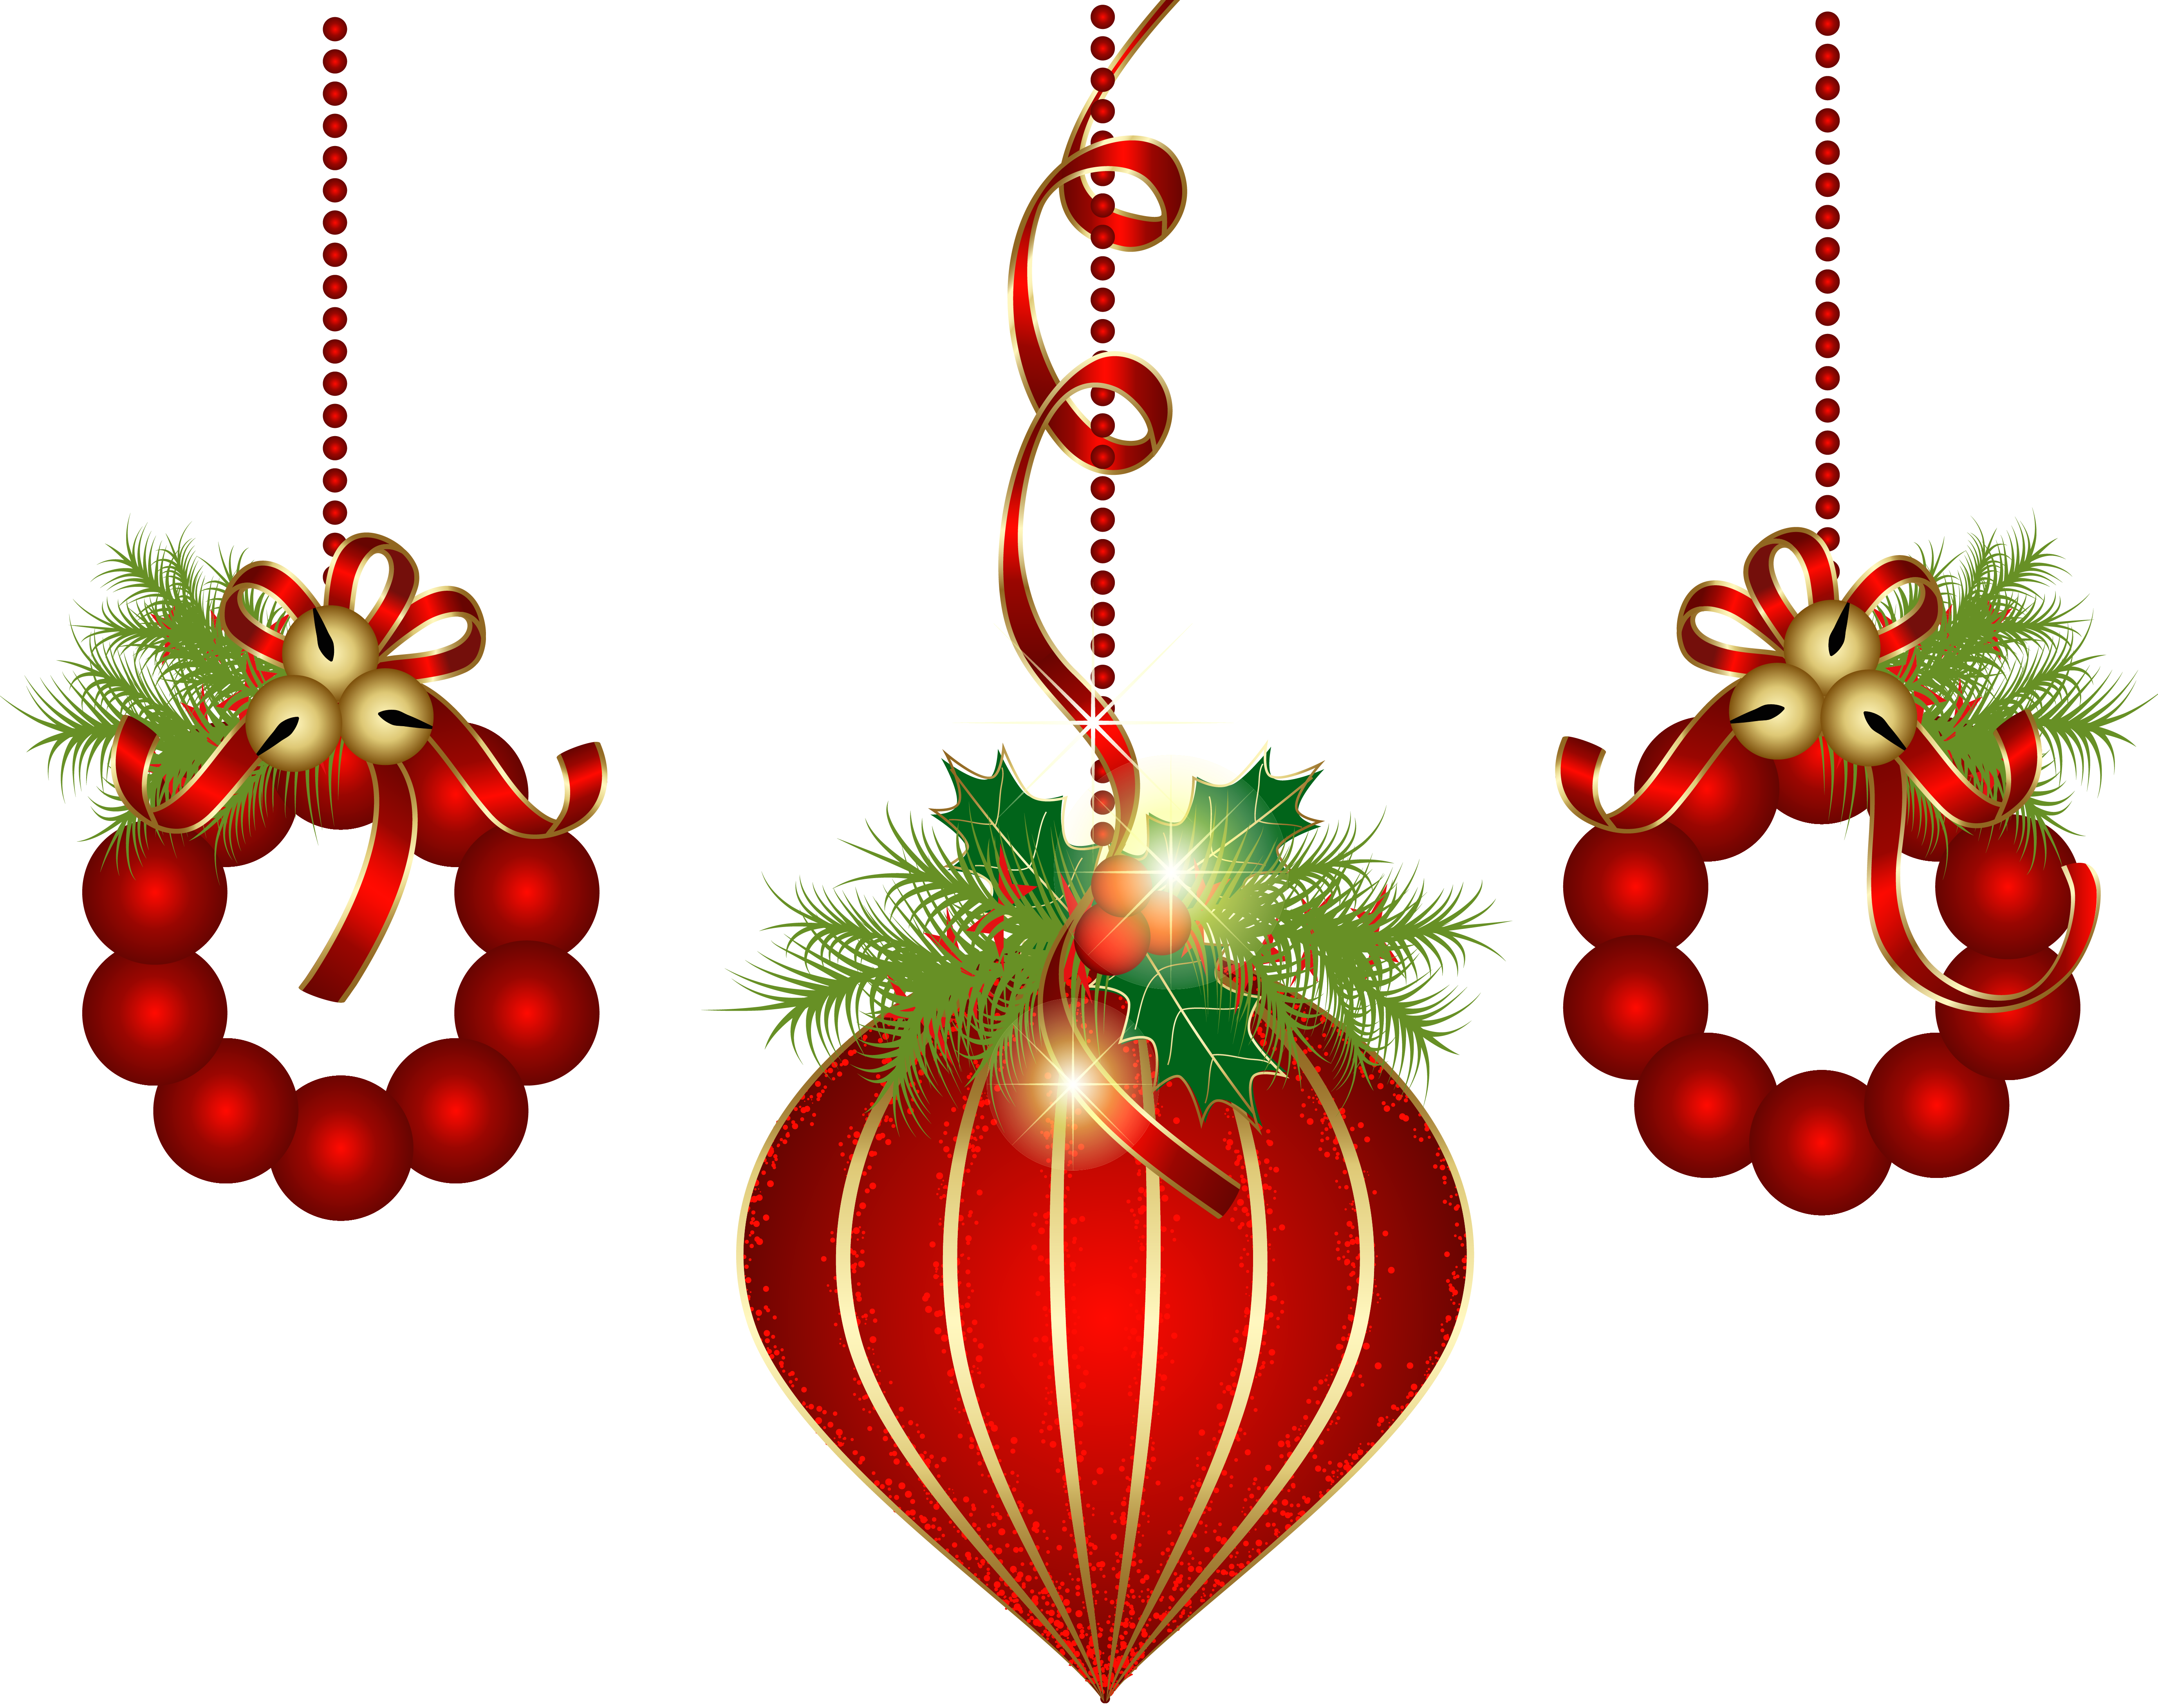 Christmas Ornament PNG - 11126